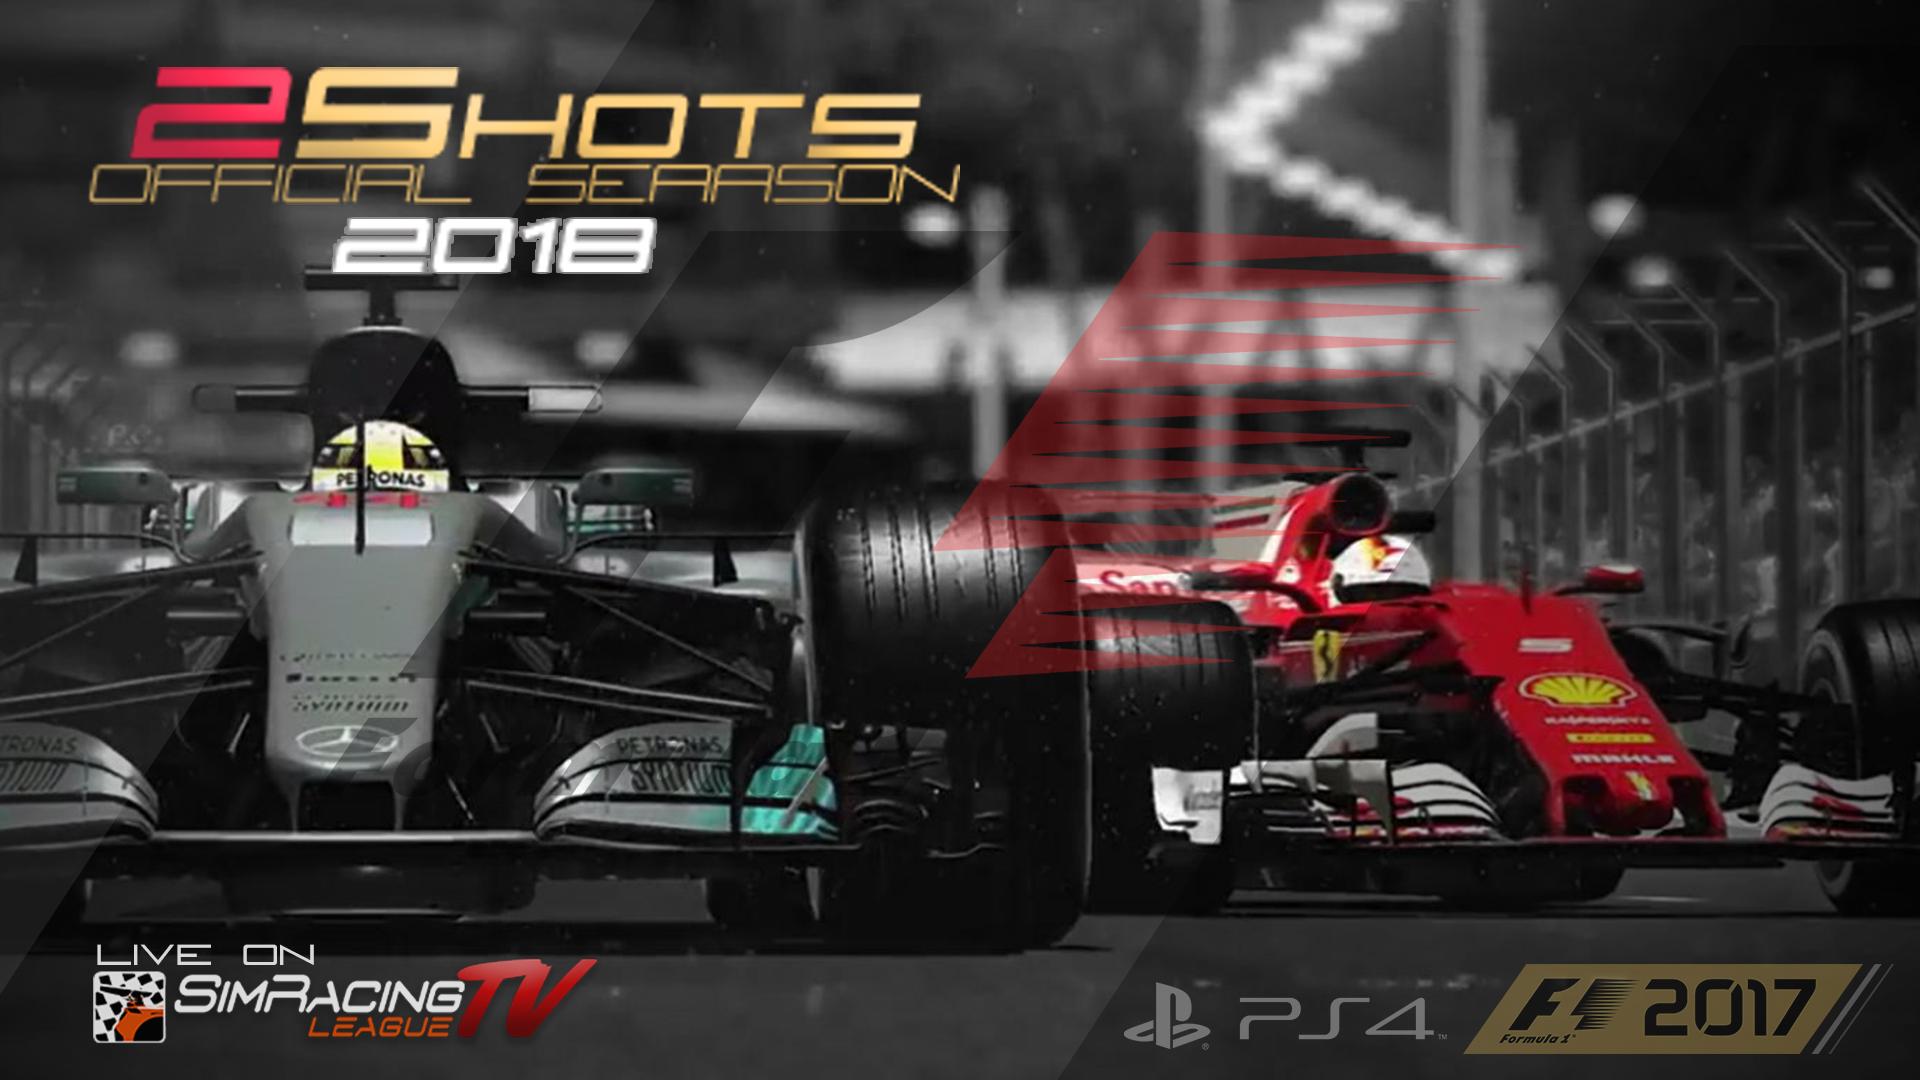 F1 2shots Official Season 2018 Gp Belgio Sim Racing League